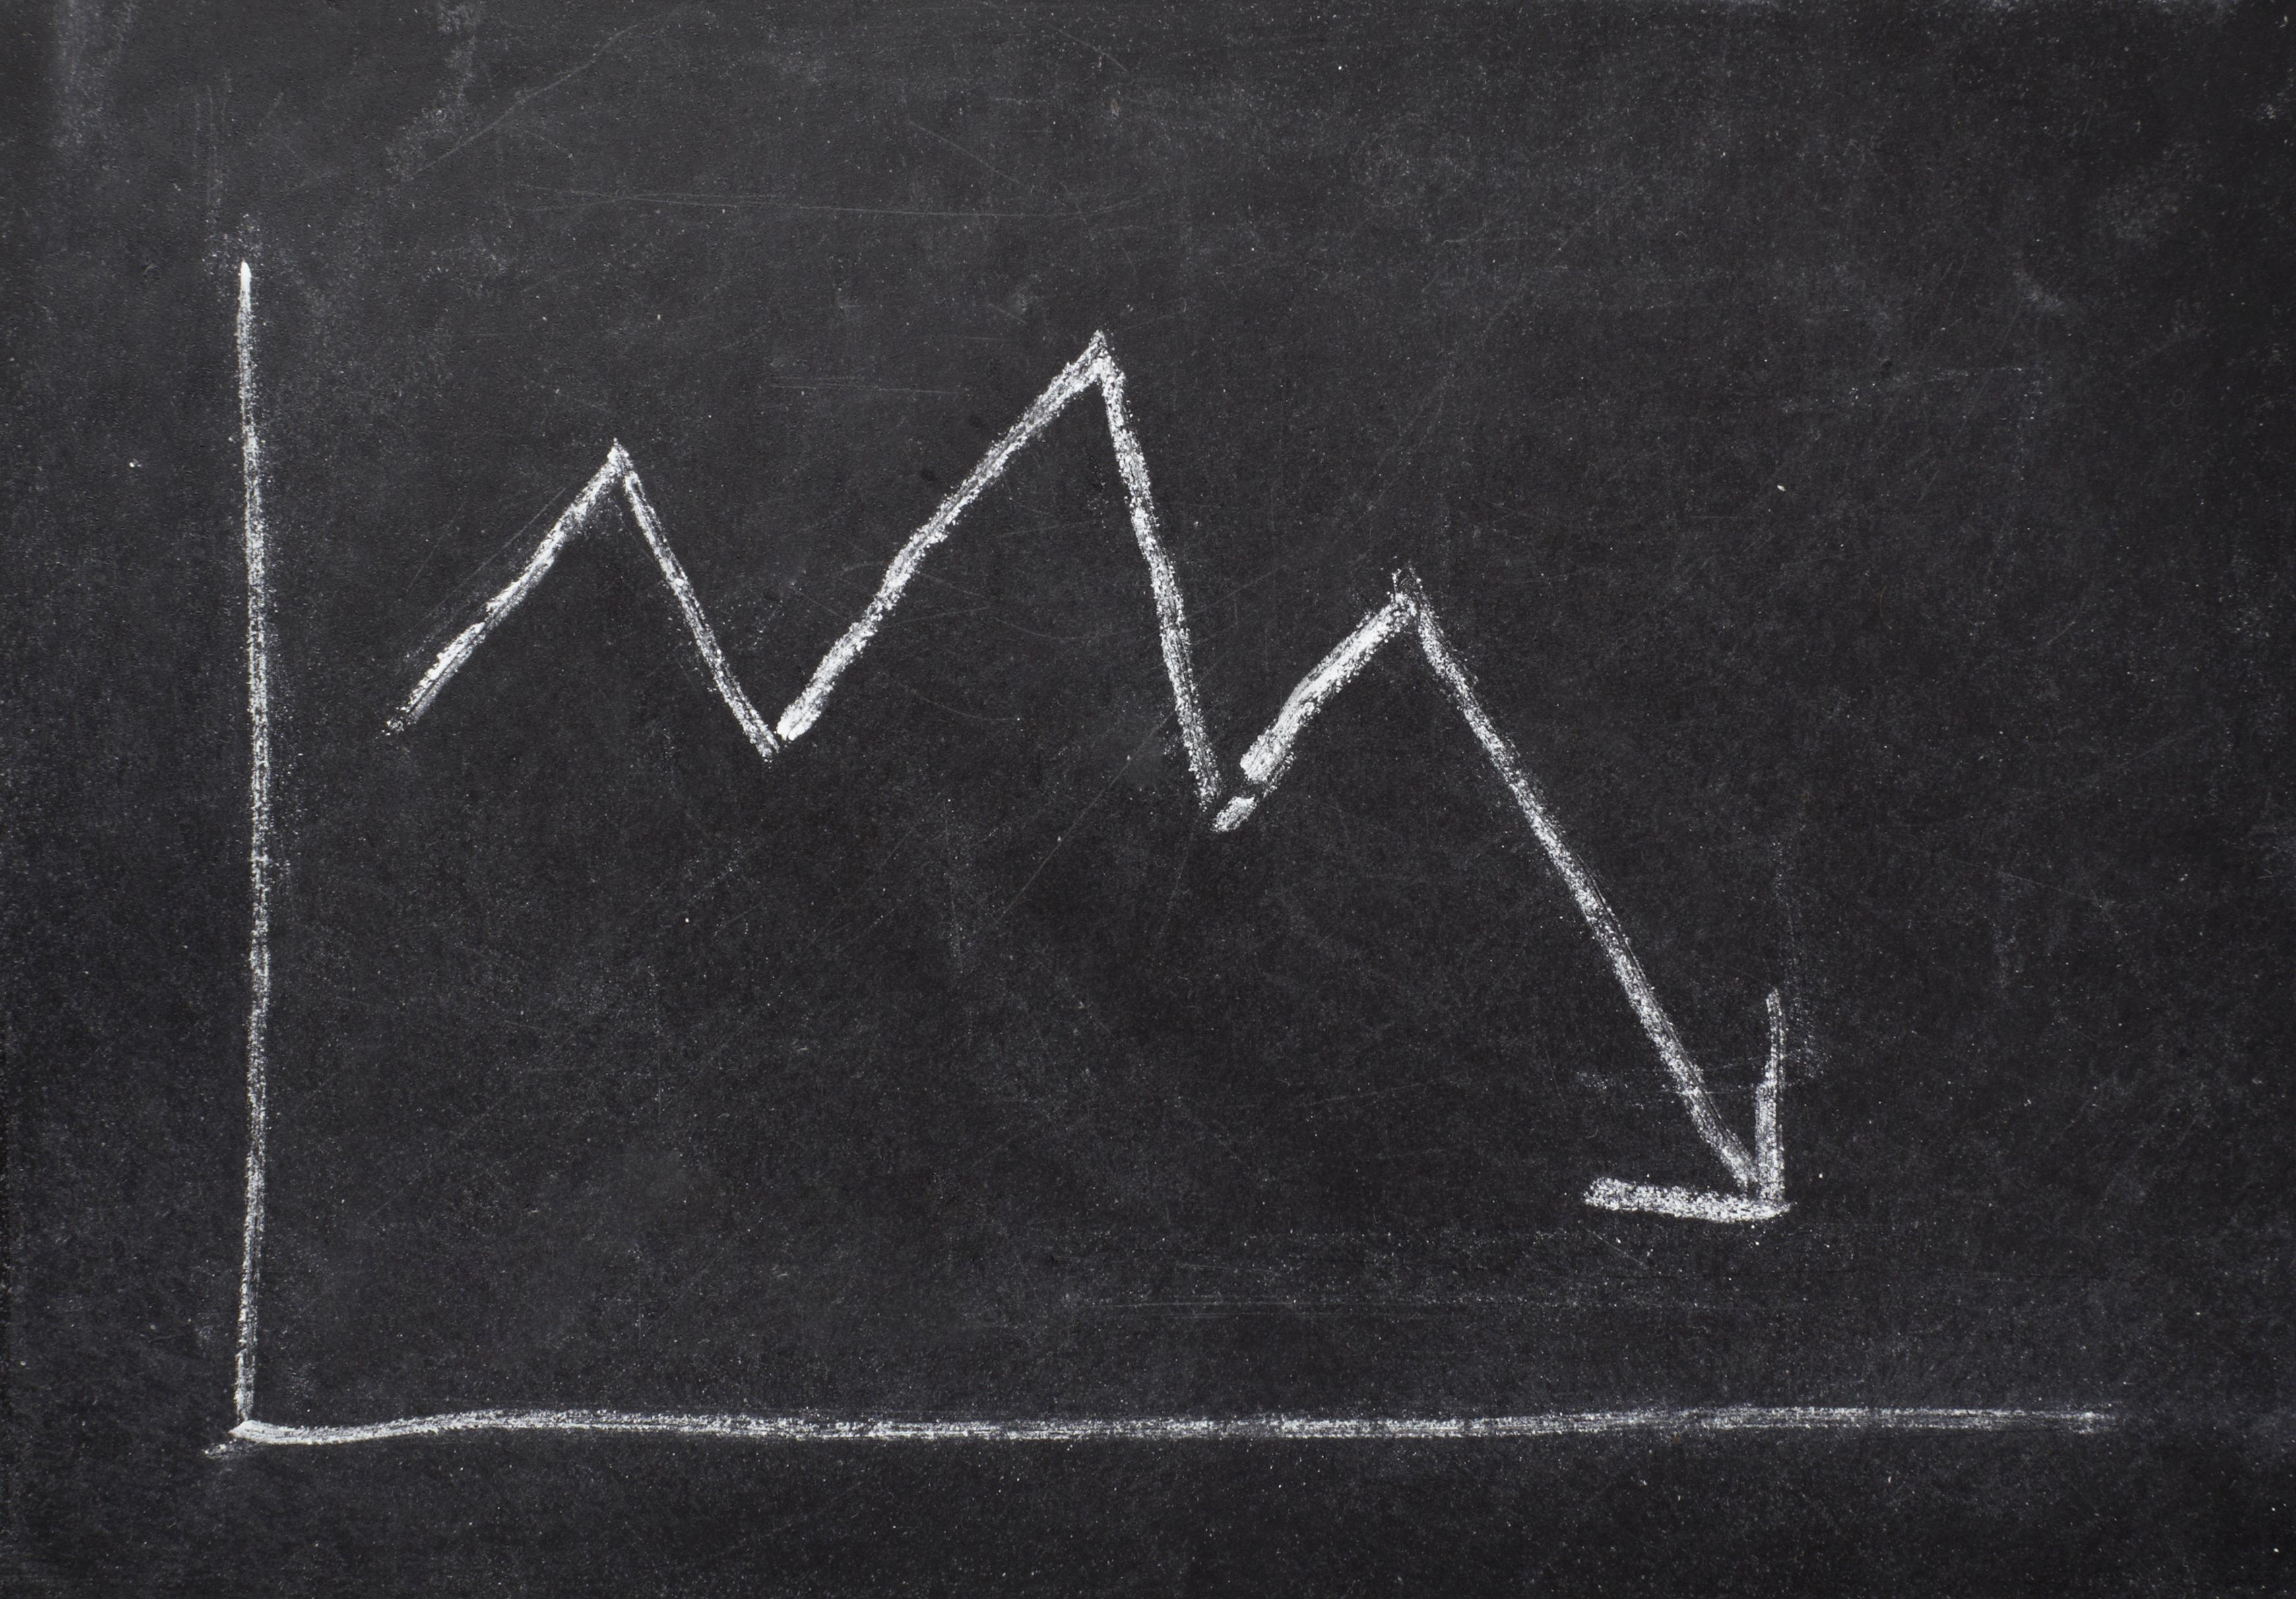 Chalkboard sketch of a stock price falling.